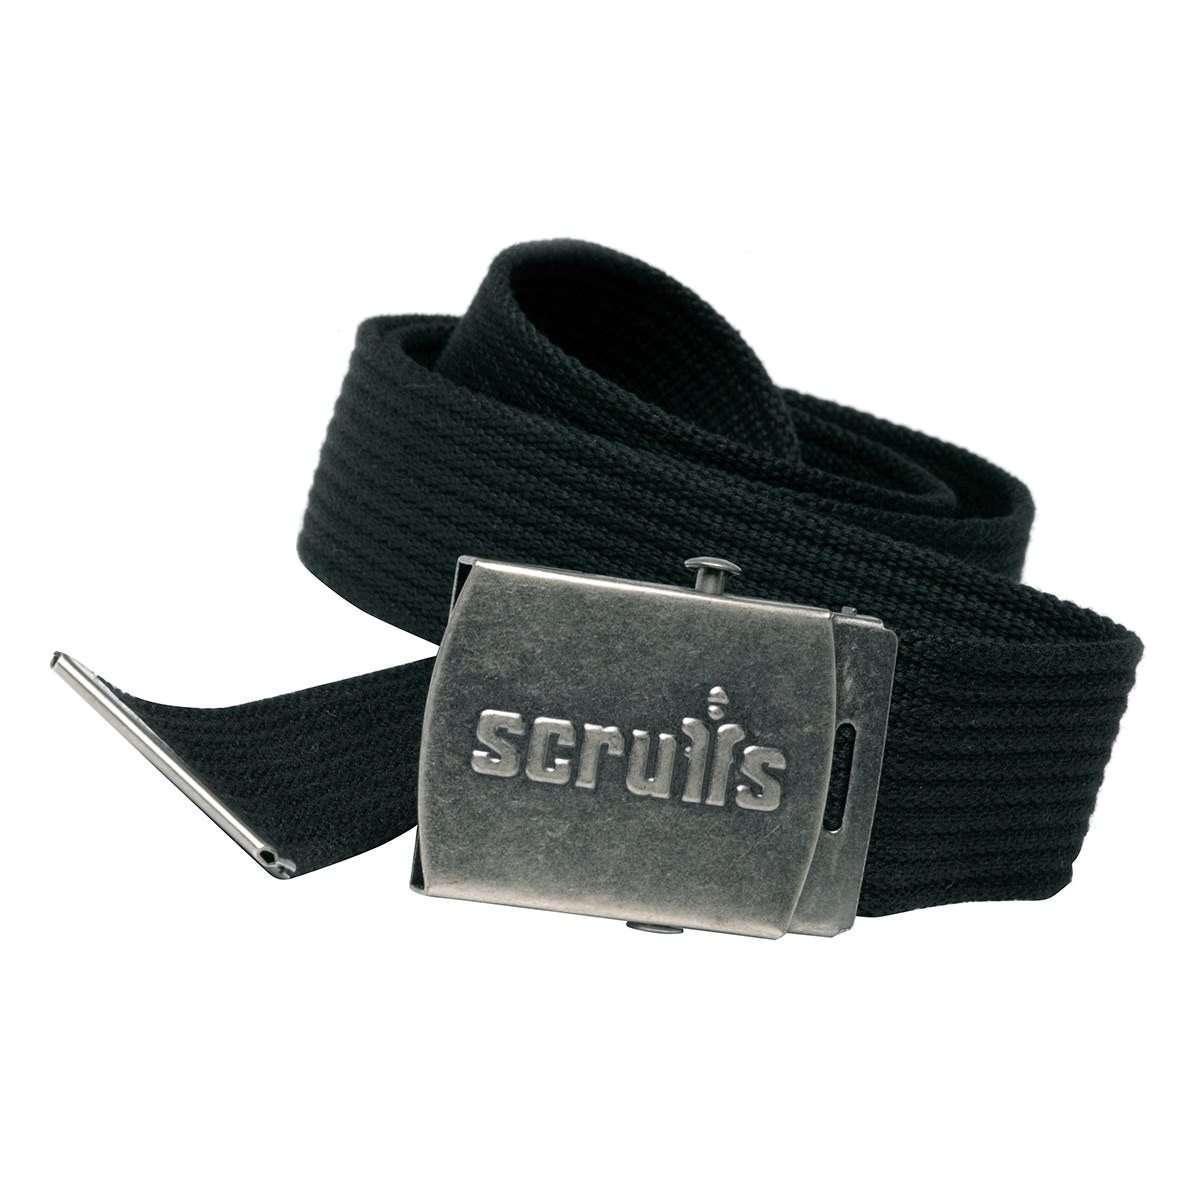 Scruffs Adjustable Clip Belt